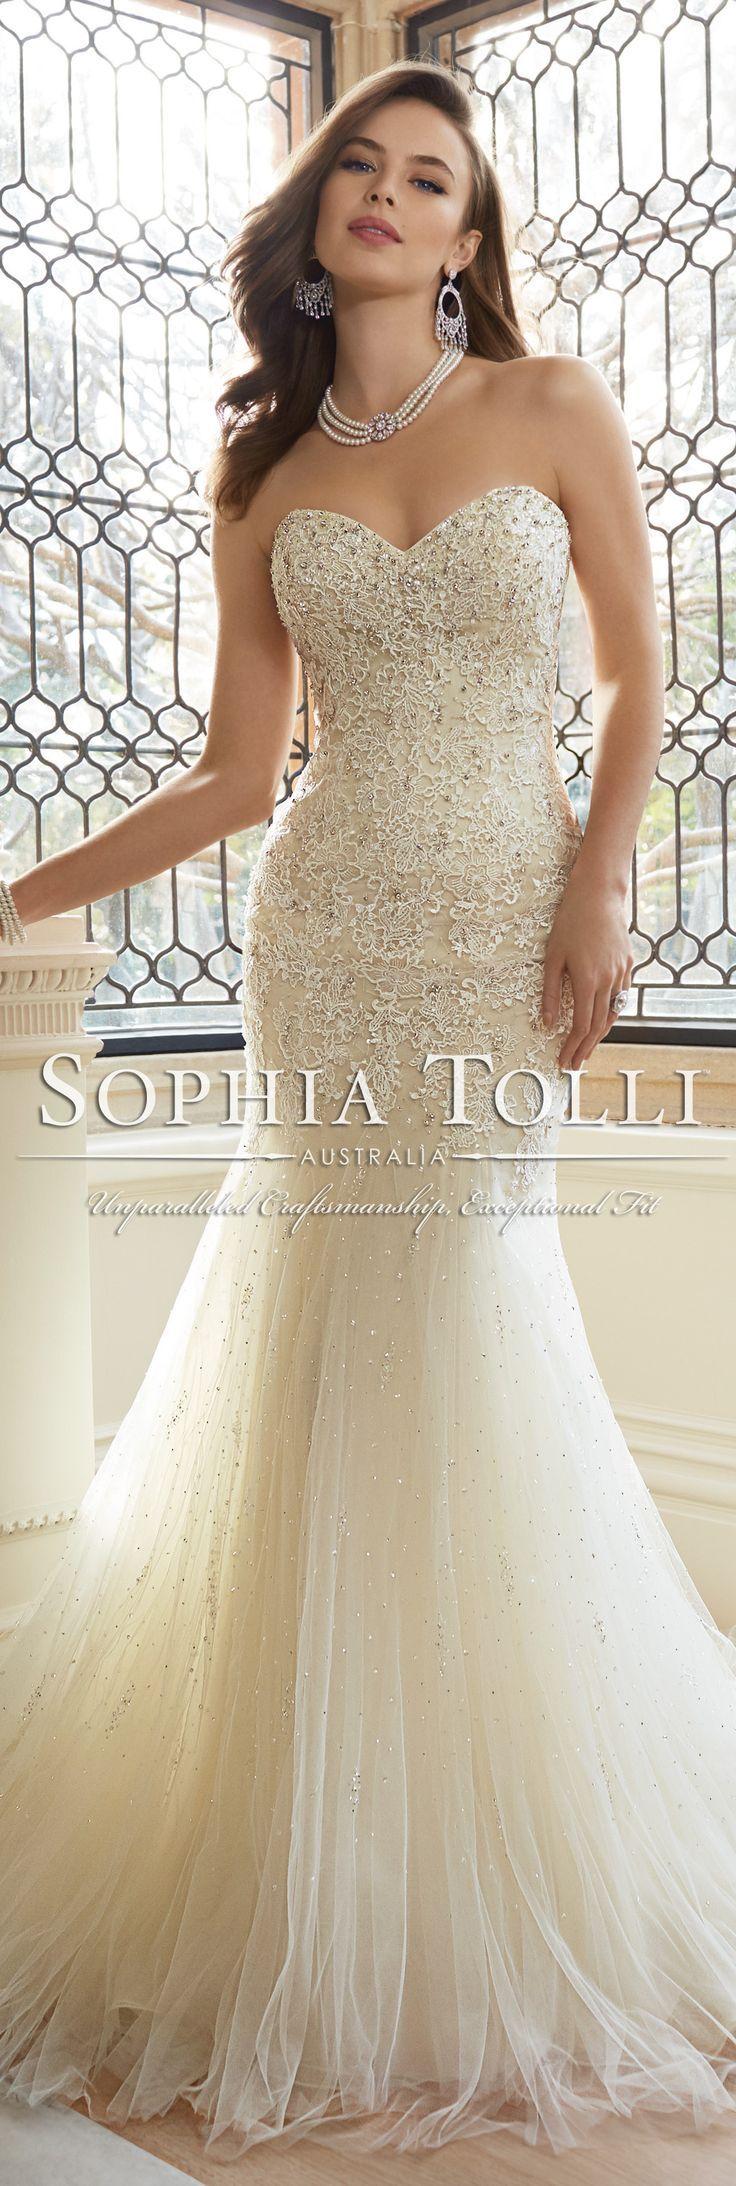 The Sophia Tolli Spring 2016 Wedding Dress Collection - Style No. Y11625 - Amira #laceweddingdress @moncheribridals